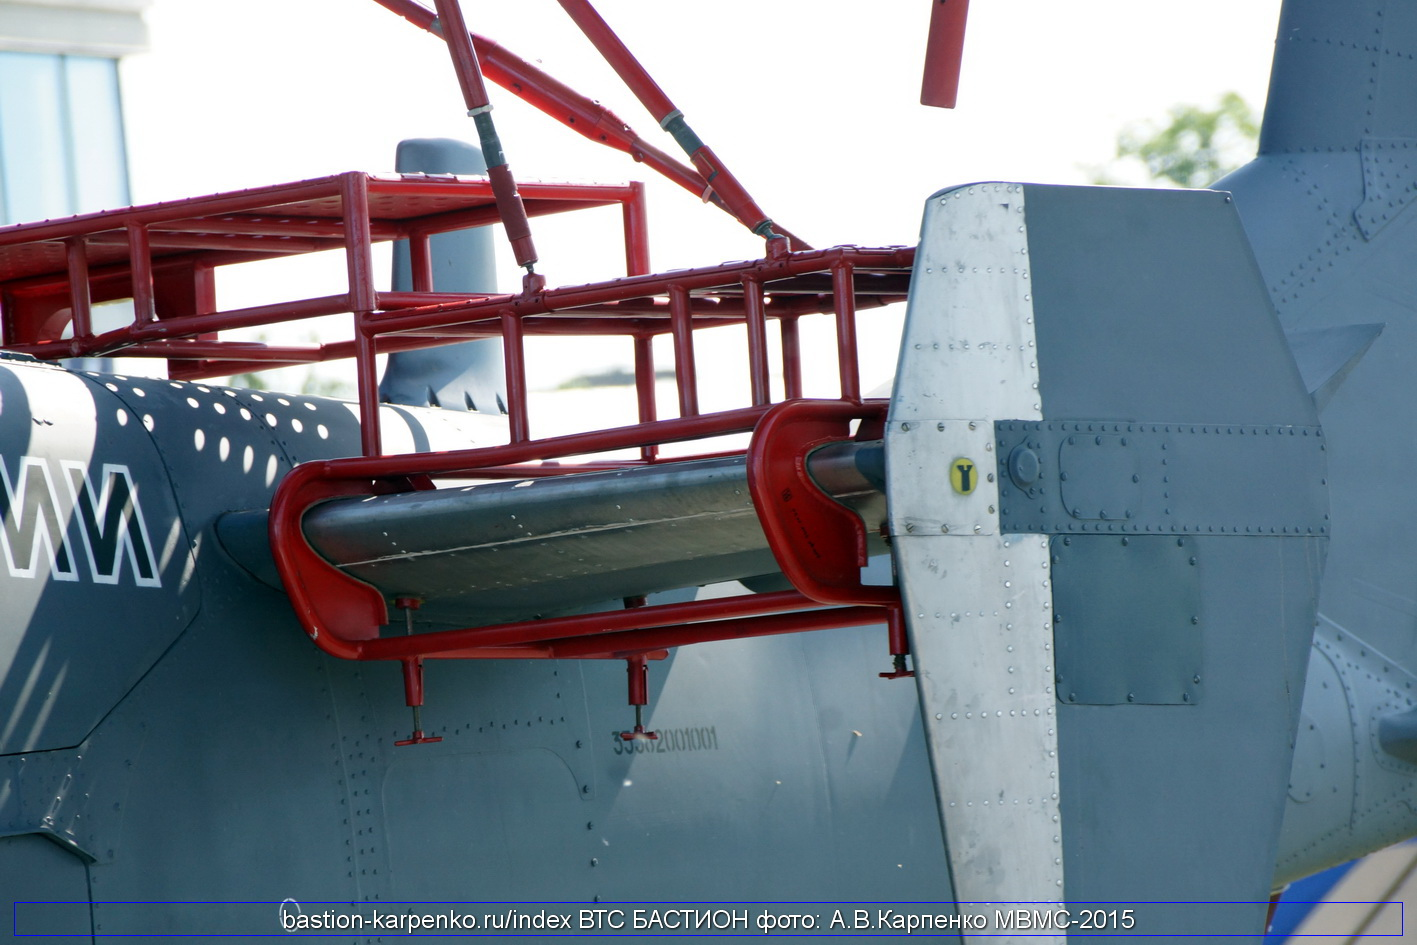 Ka-52K for Russian Navy - Page 2 KA-52K_MVMS-2015_54